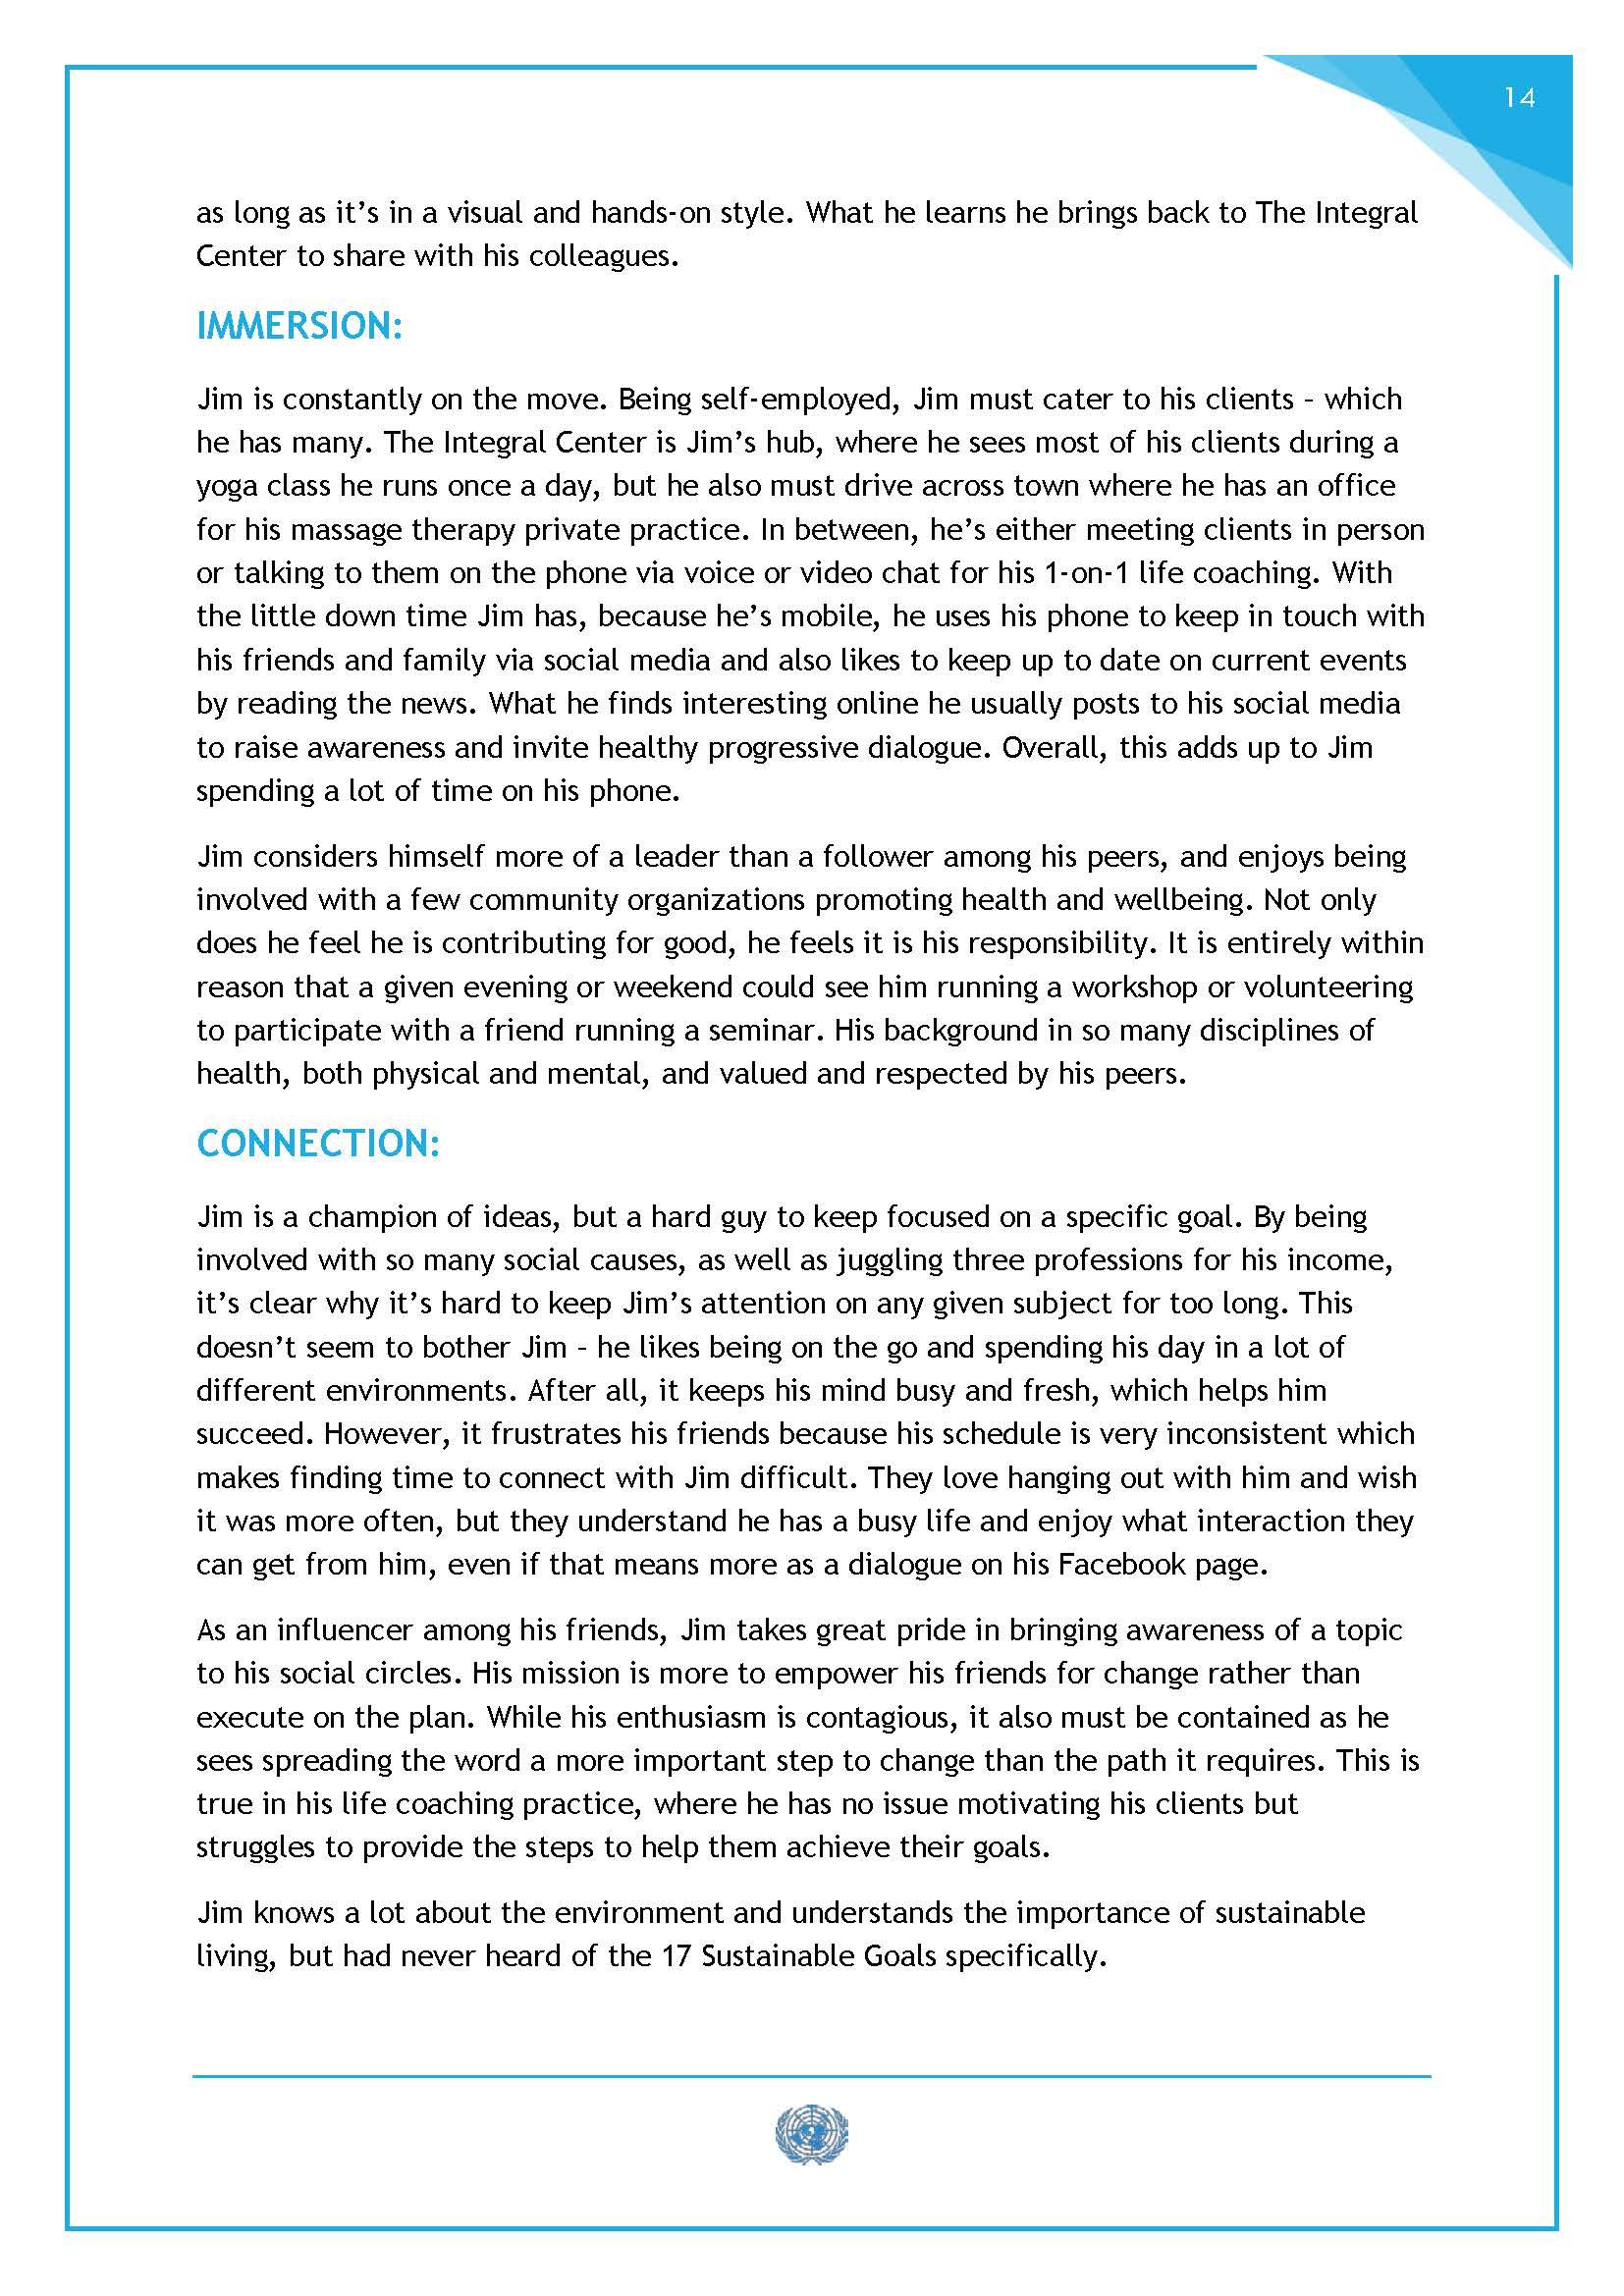 Design Document_Kraus&Beatty_Page_15.jpg